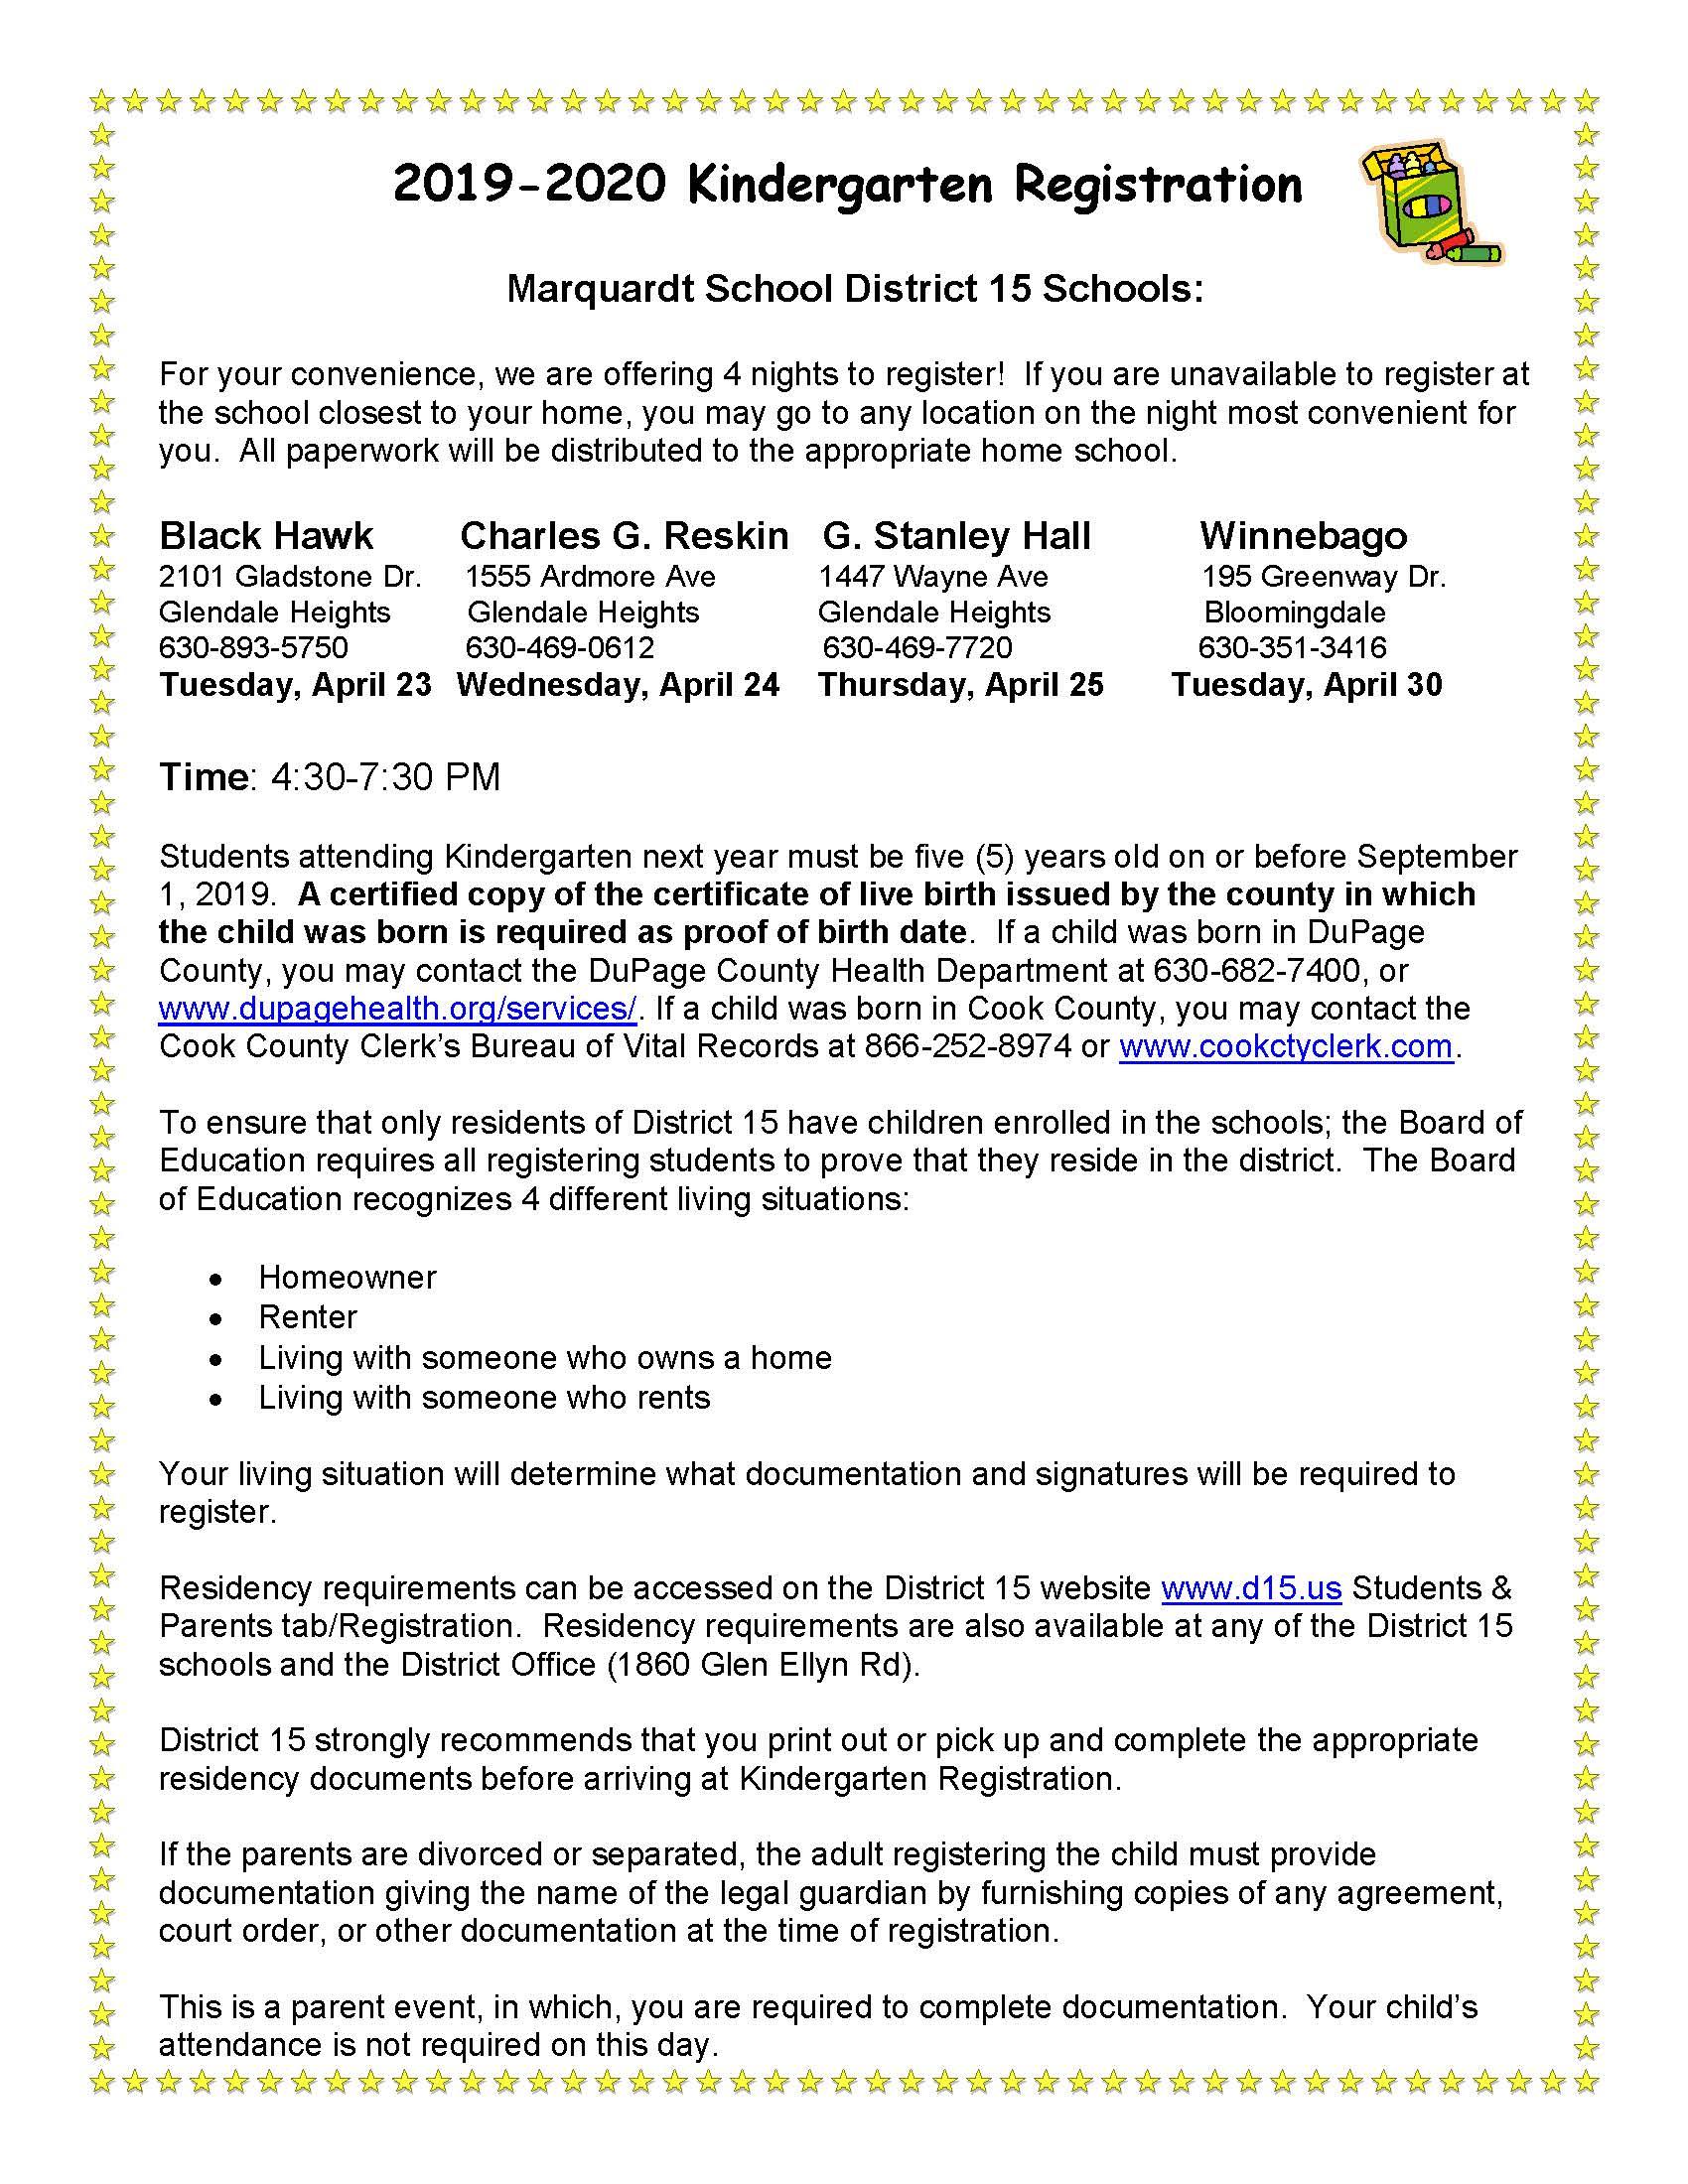 Kindergarten Flyer 2019-2020_Page_1 (4).jpg